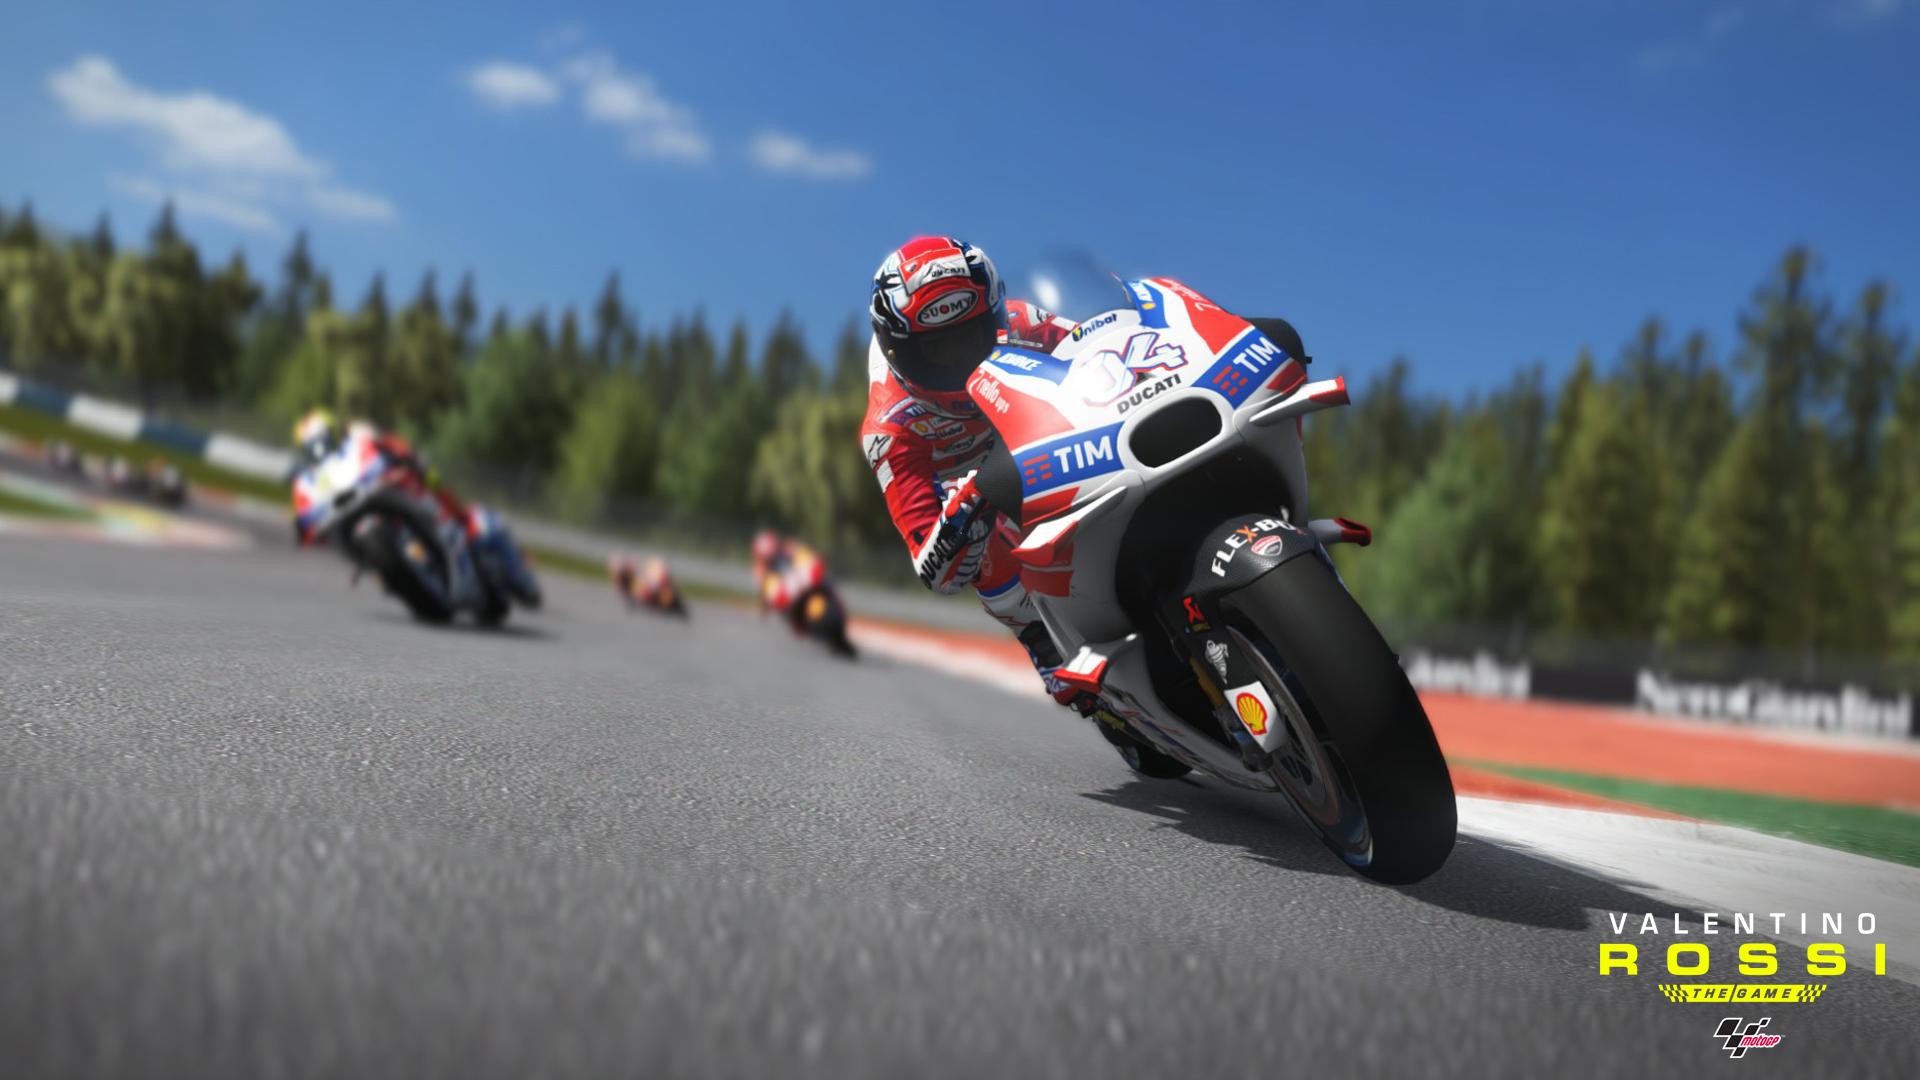 Valentino Rossi The Game: Κυκλοφόρησε για PS4, Xbox & PC 2016-05-17_172238-copy